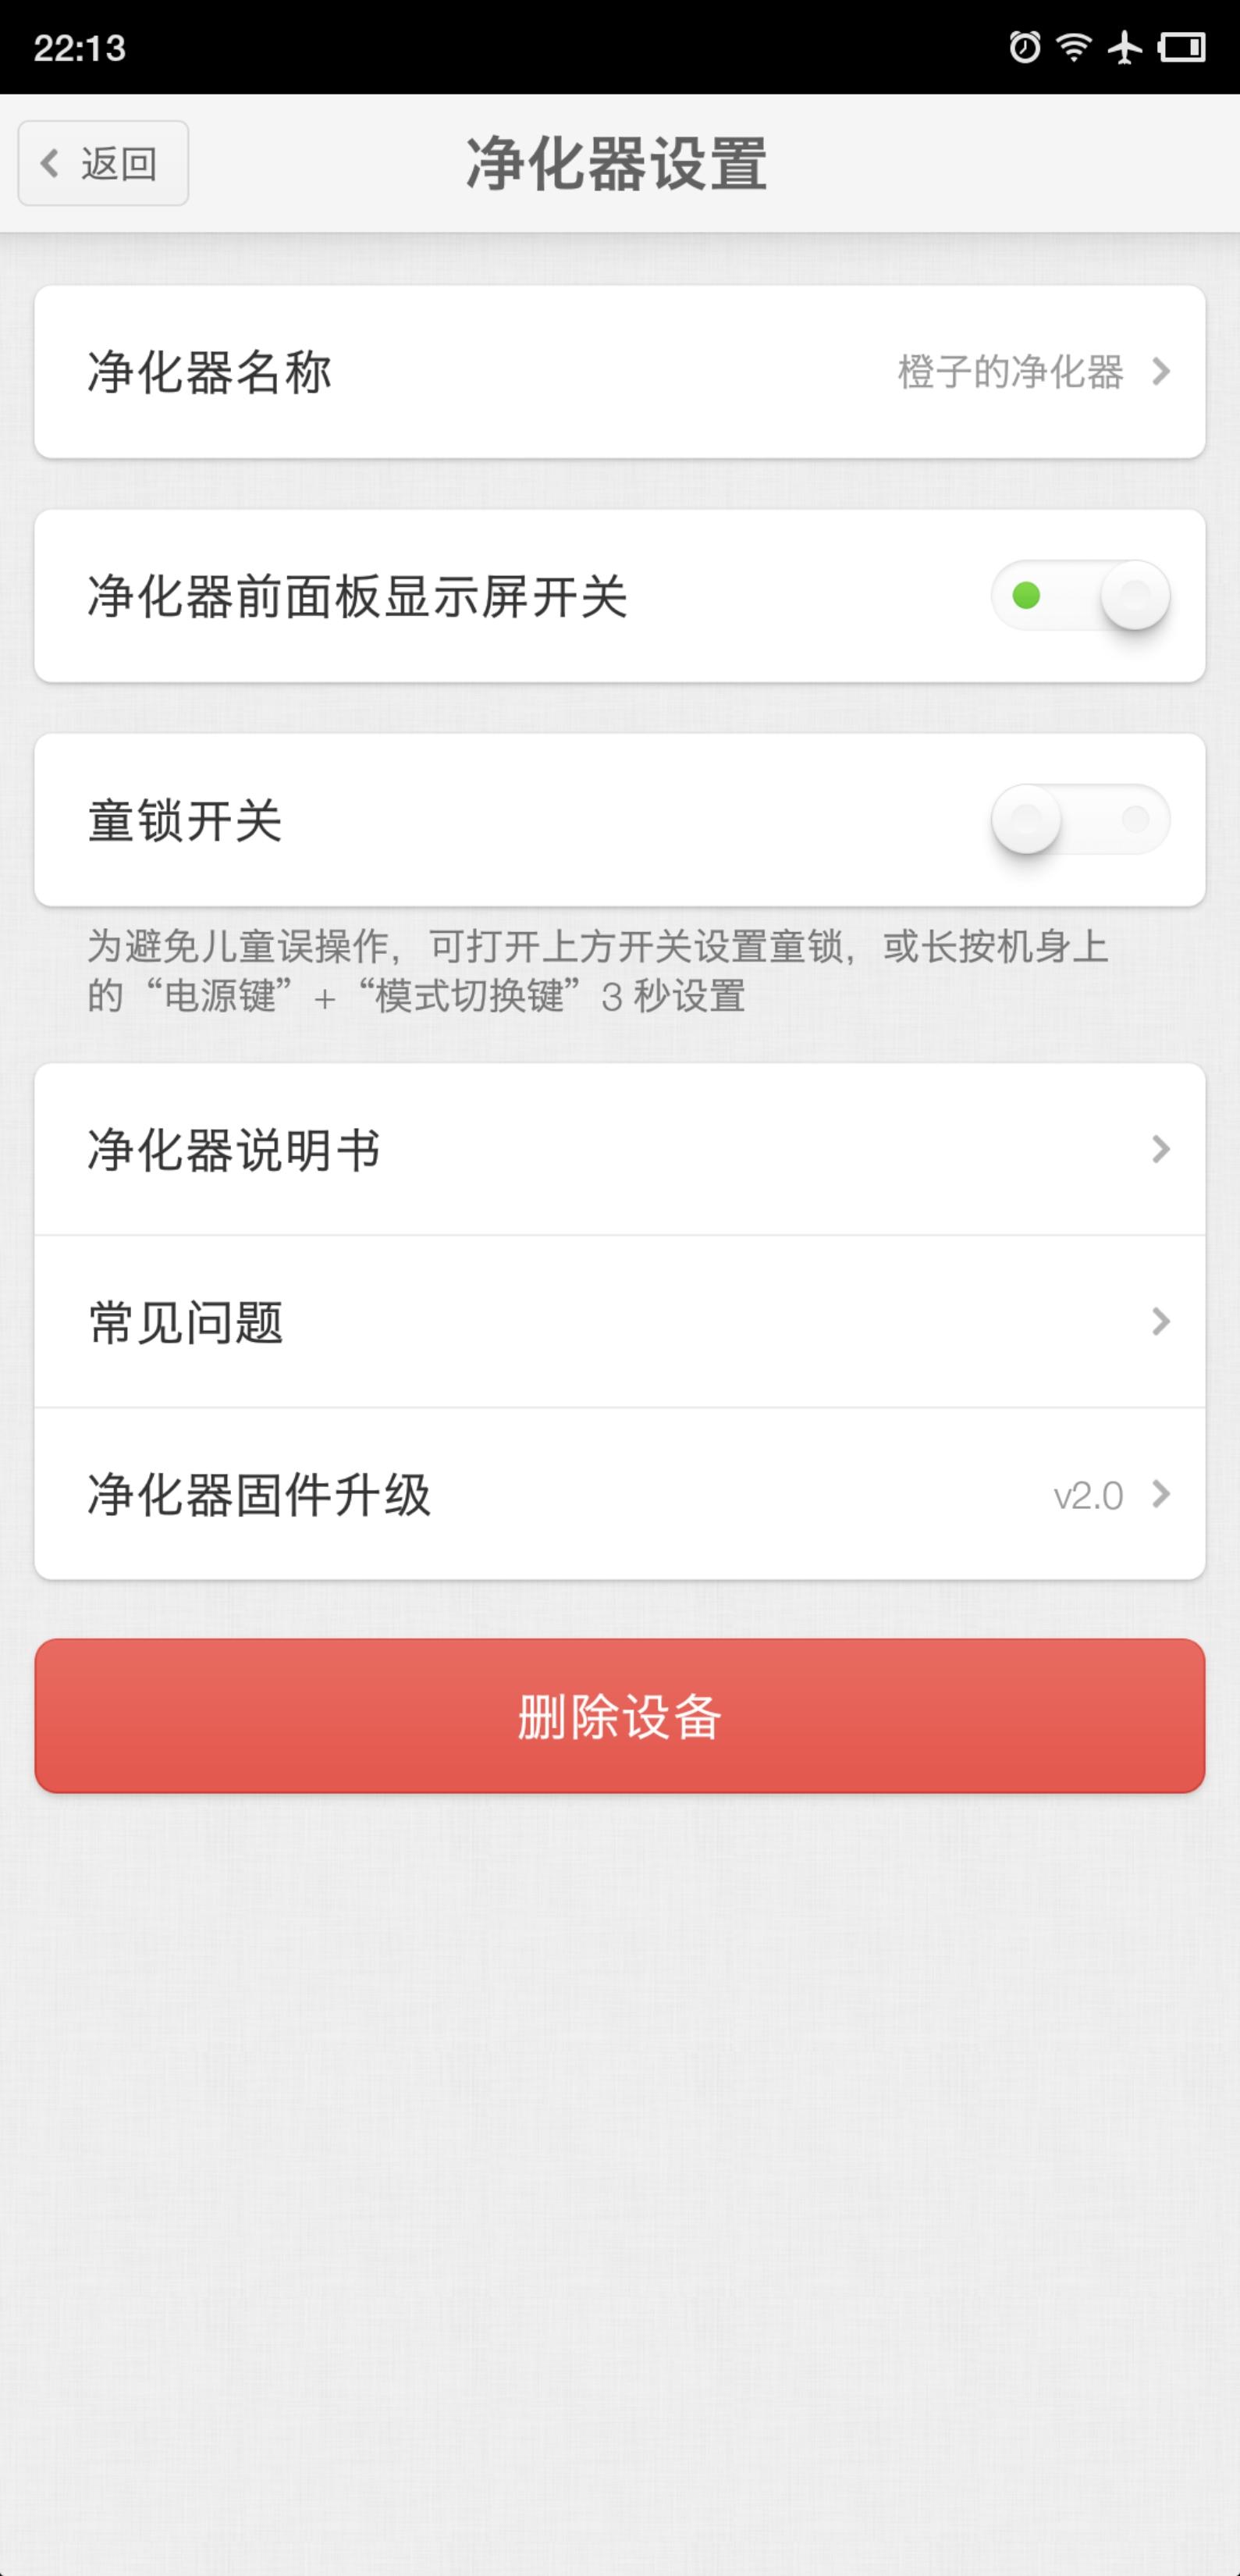 Screenshot_2018-05-28-22-13-29-963_???.png